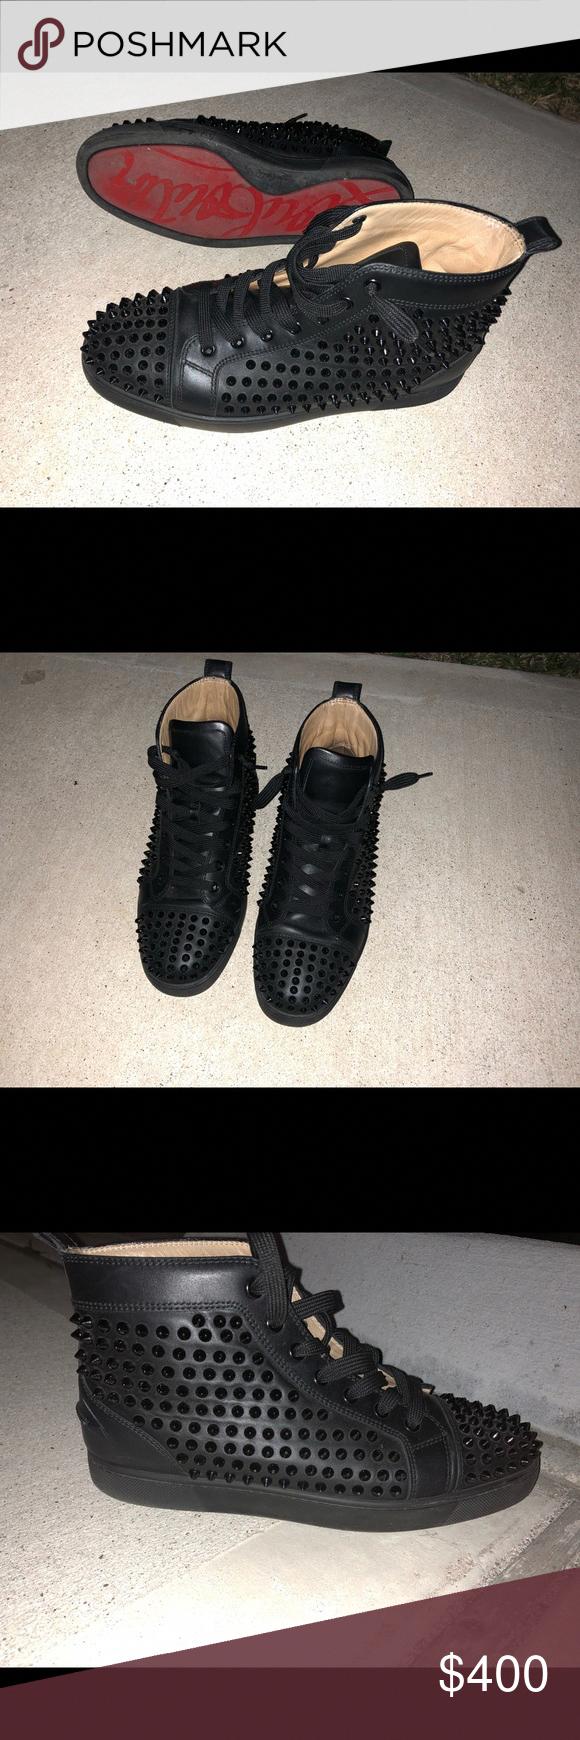 c12310e01817a Men's Christian Louboutin Red Bottoms Size 7.5 in men's Christian Louboutin Shoes  Sneakers #ChristianLouboutin